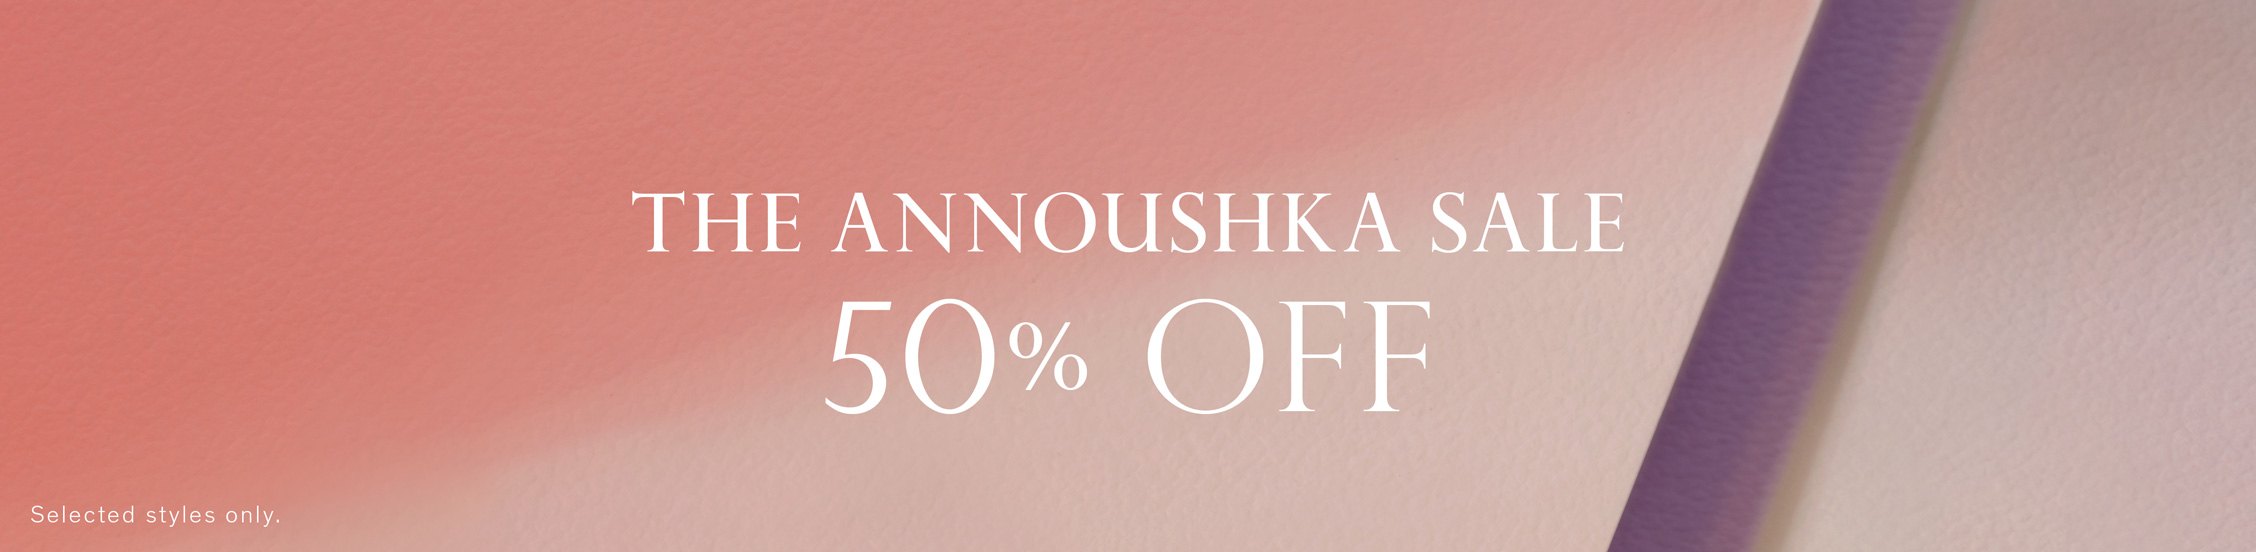 Annoushka Sale 2019